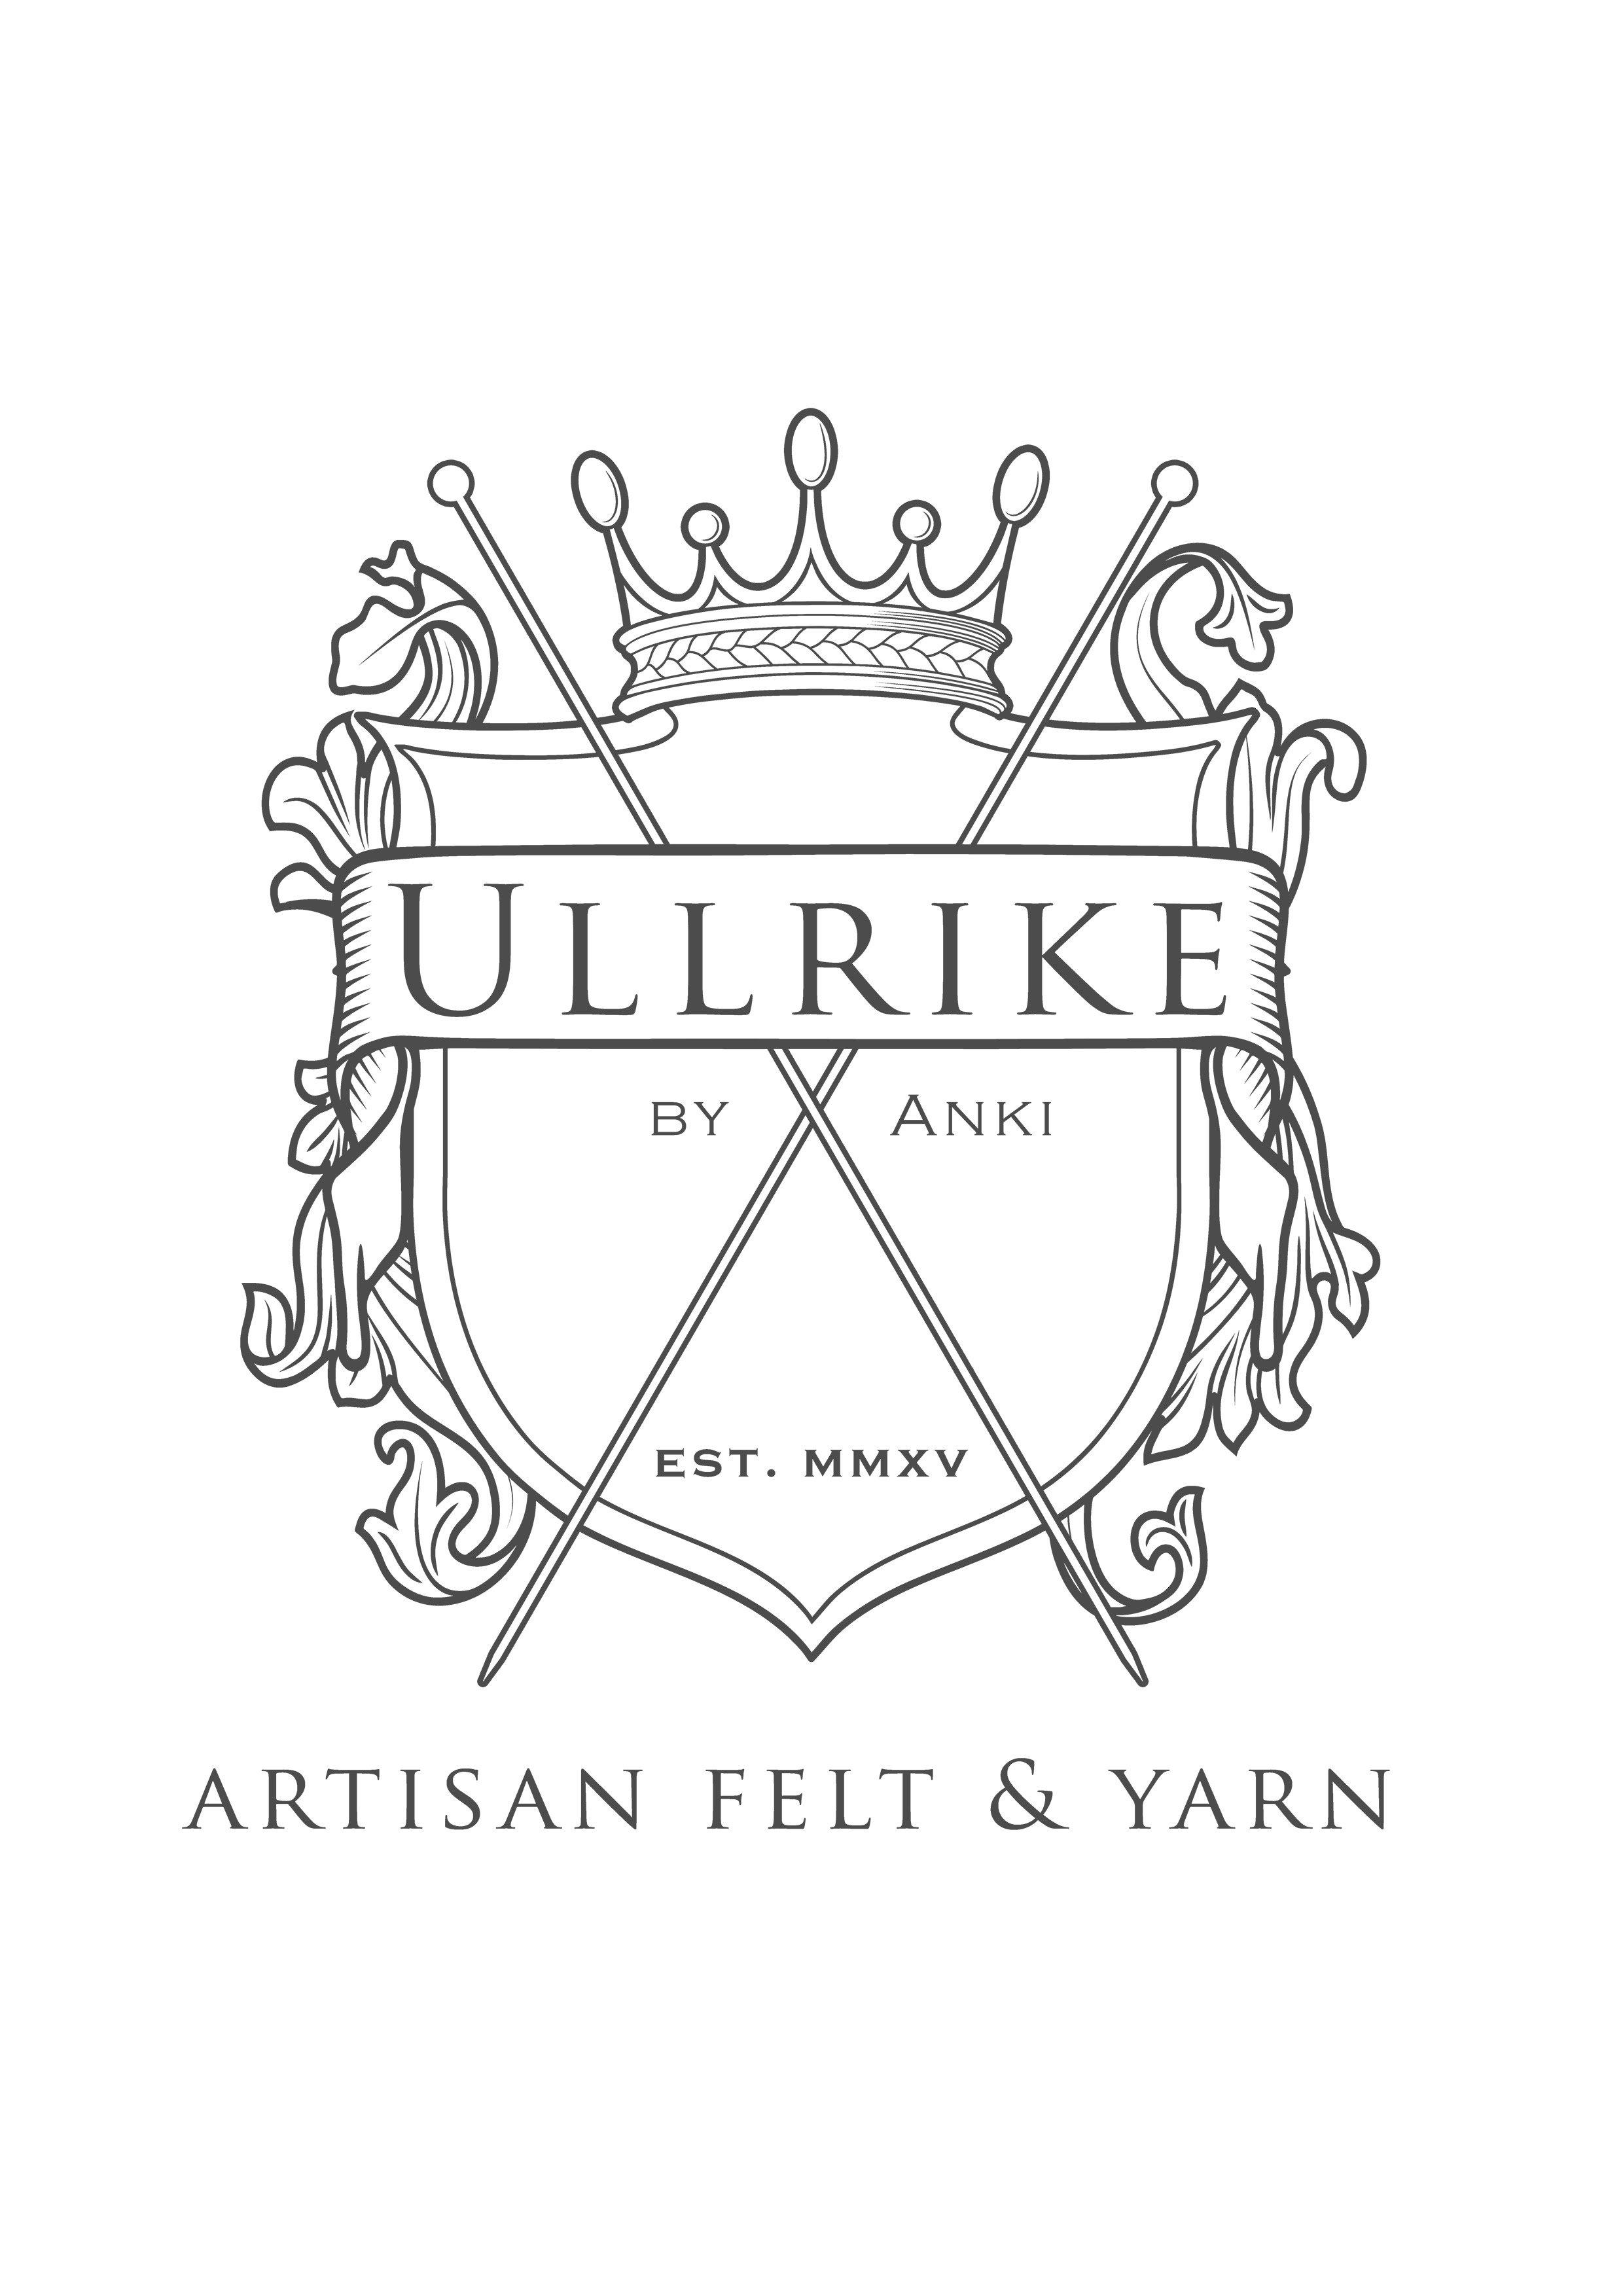 Ullrike by Anki